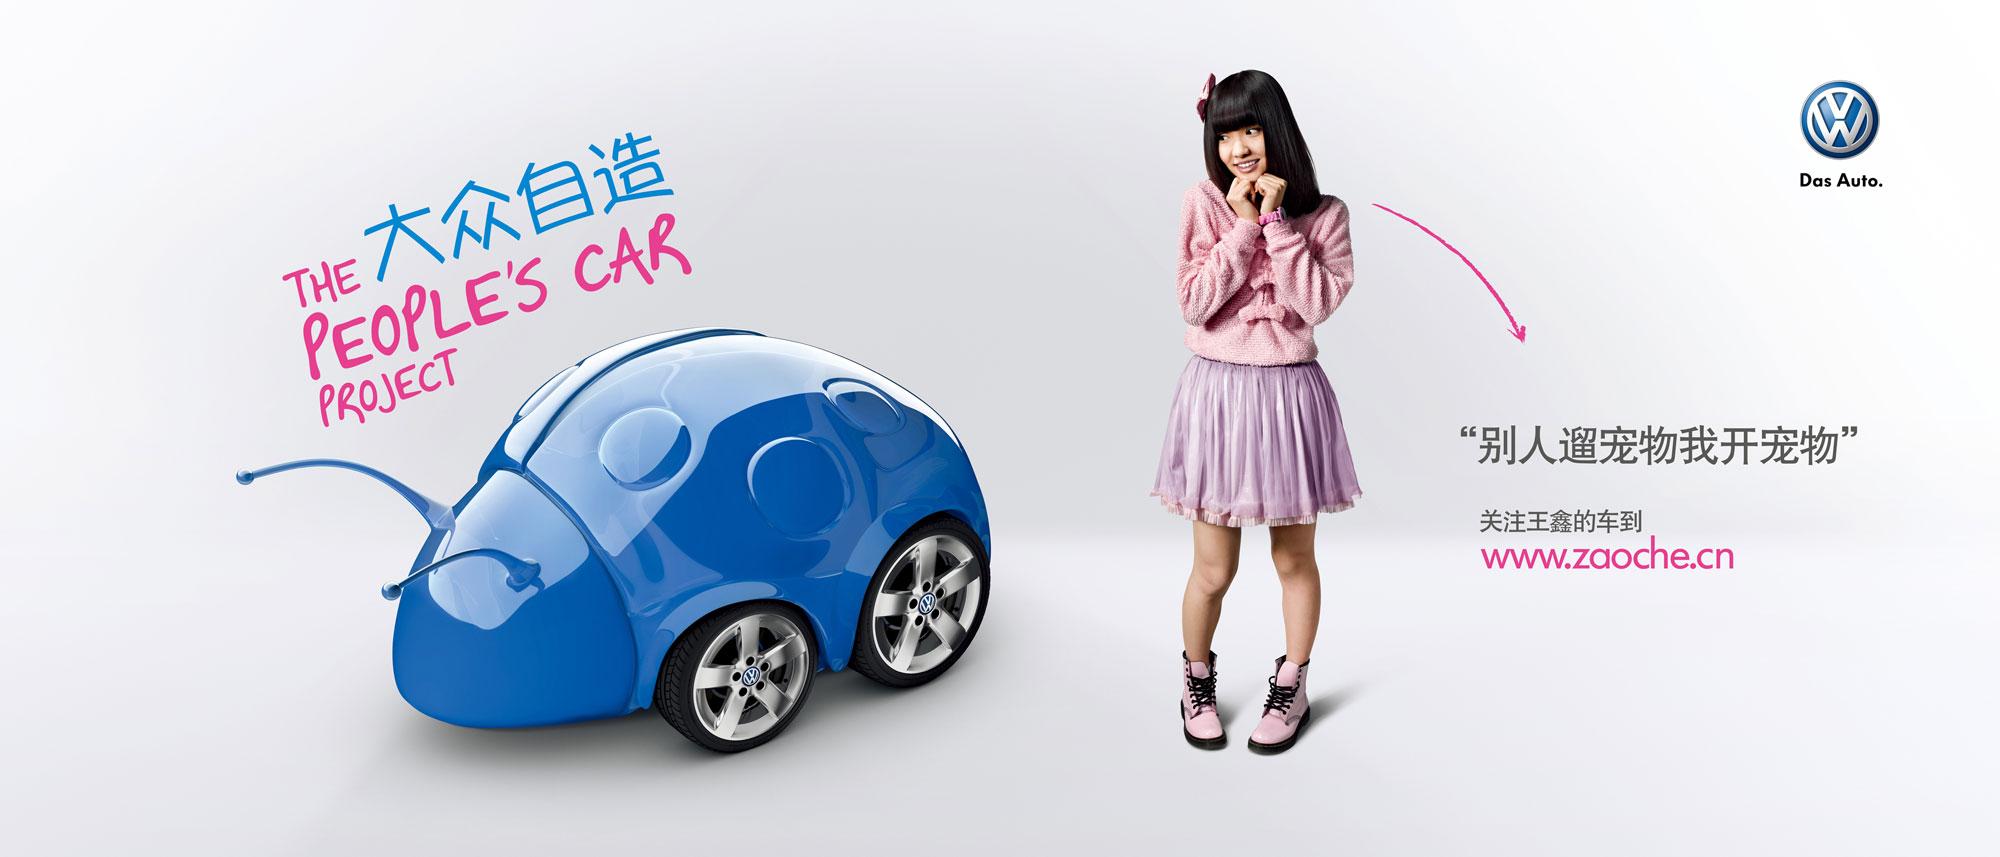 VW_OOH_Ladybug_Horizontal_RGB_o.jpg